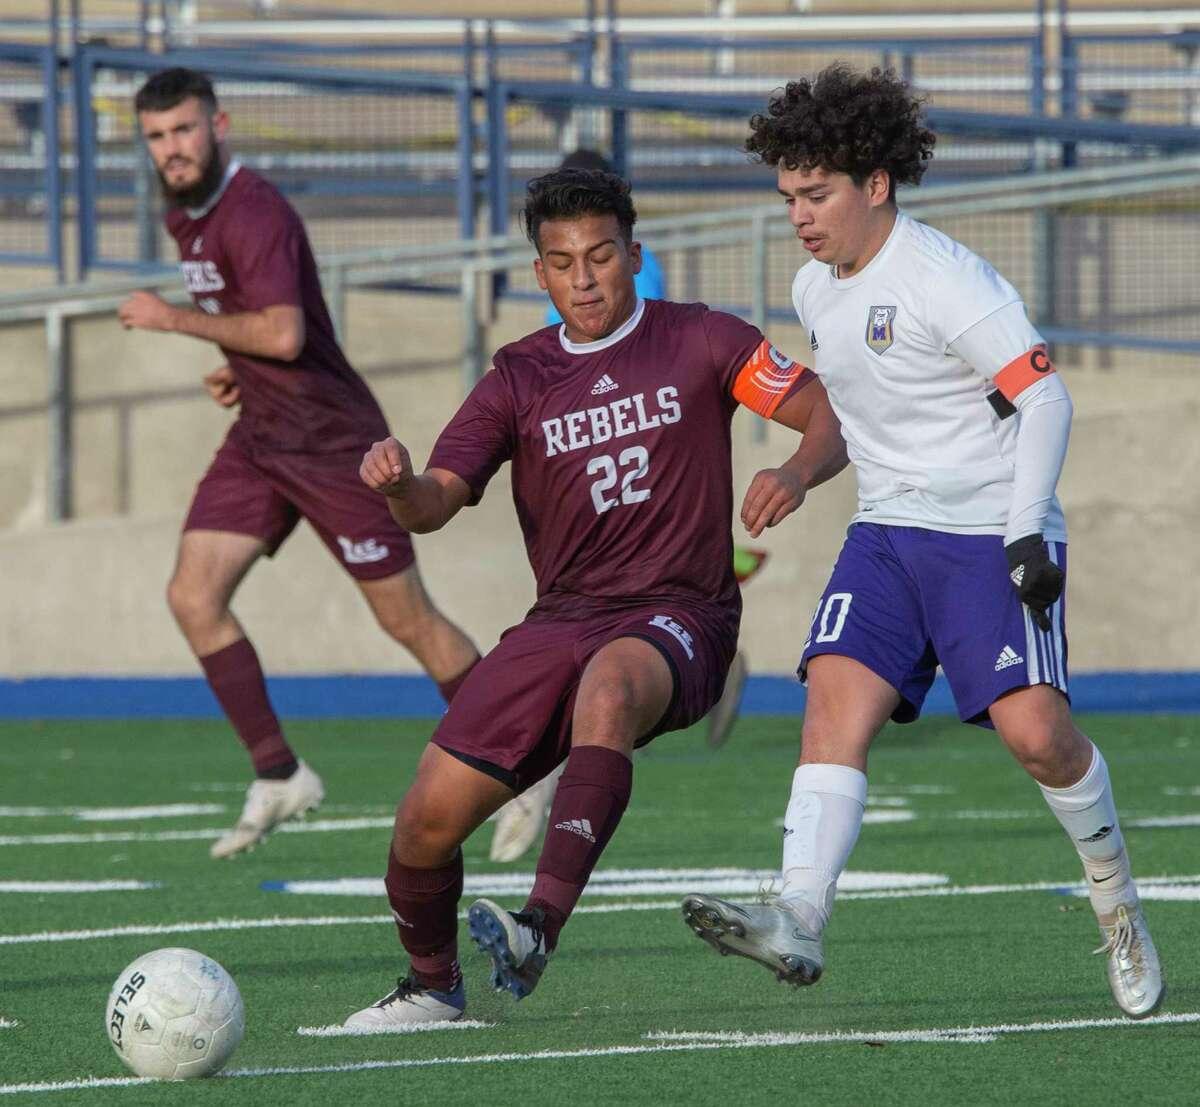 Lee High's Jacob Maltos and Midland High's Israel Ramirez battle for the ball 03/05/2021 at Grande Communications Stadium. Tim Fischer/Reporter-Telegram